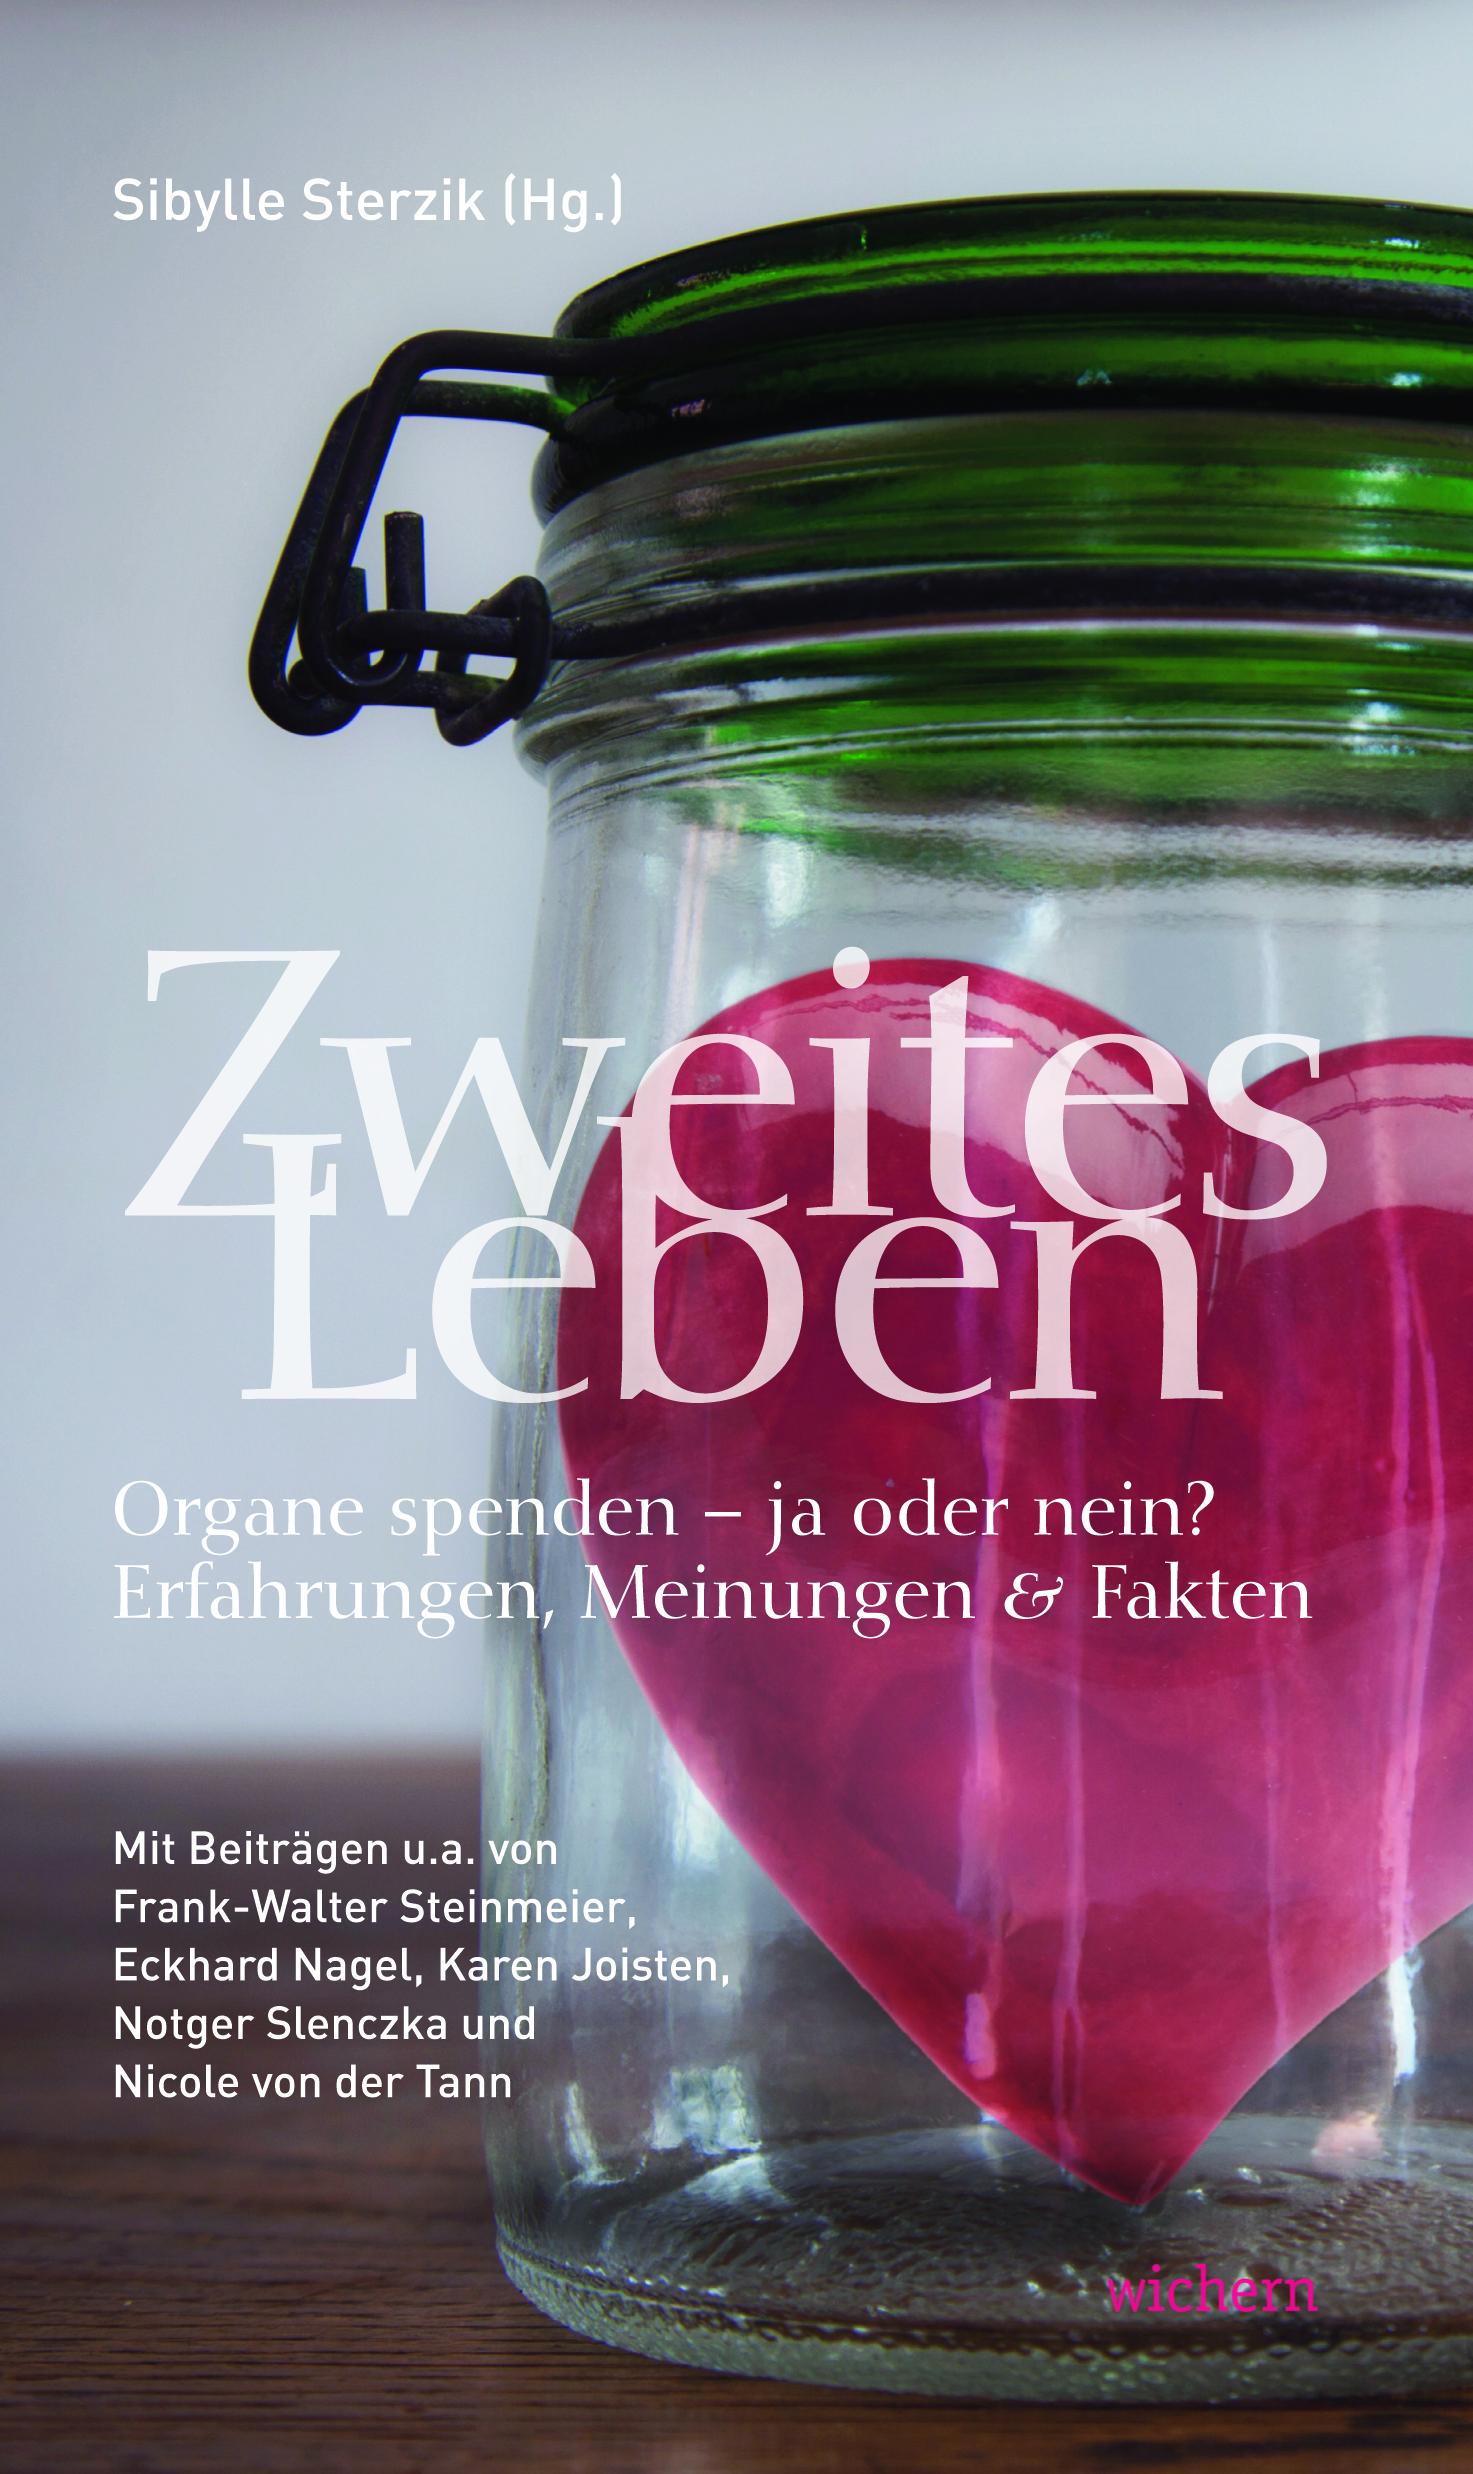 Sibylle Sterzik: Zweites Leben Organtransplantation Sterzik Zweites Leben